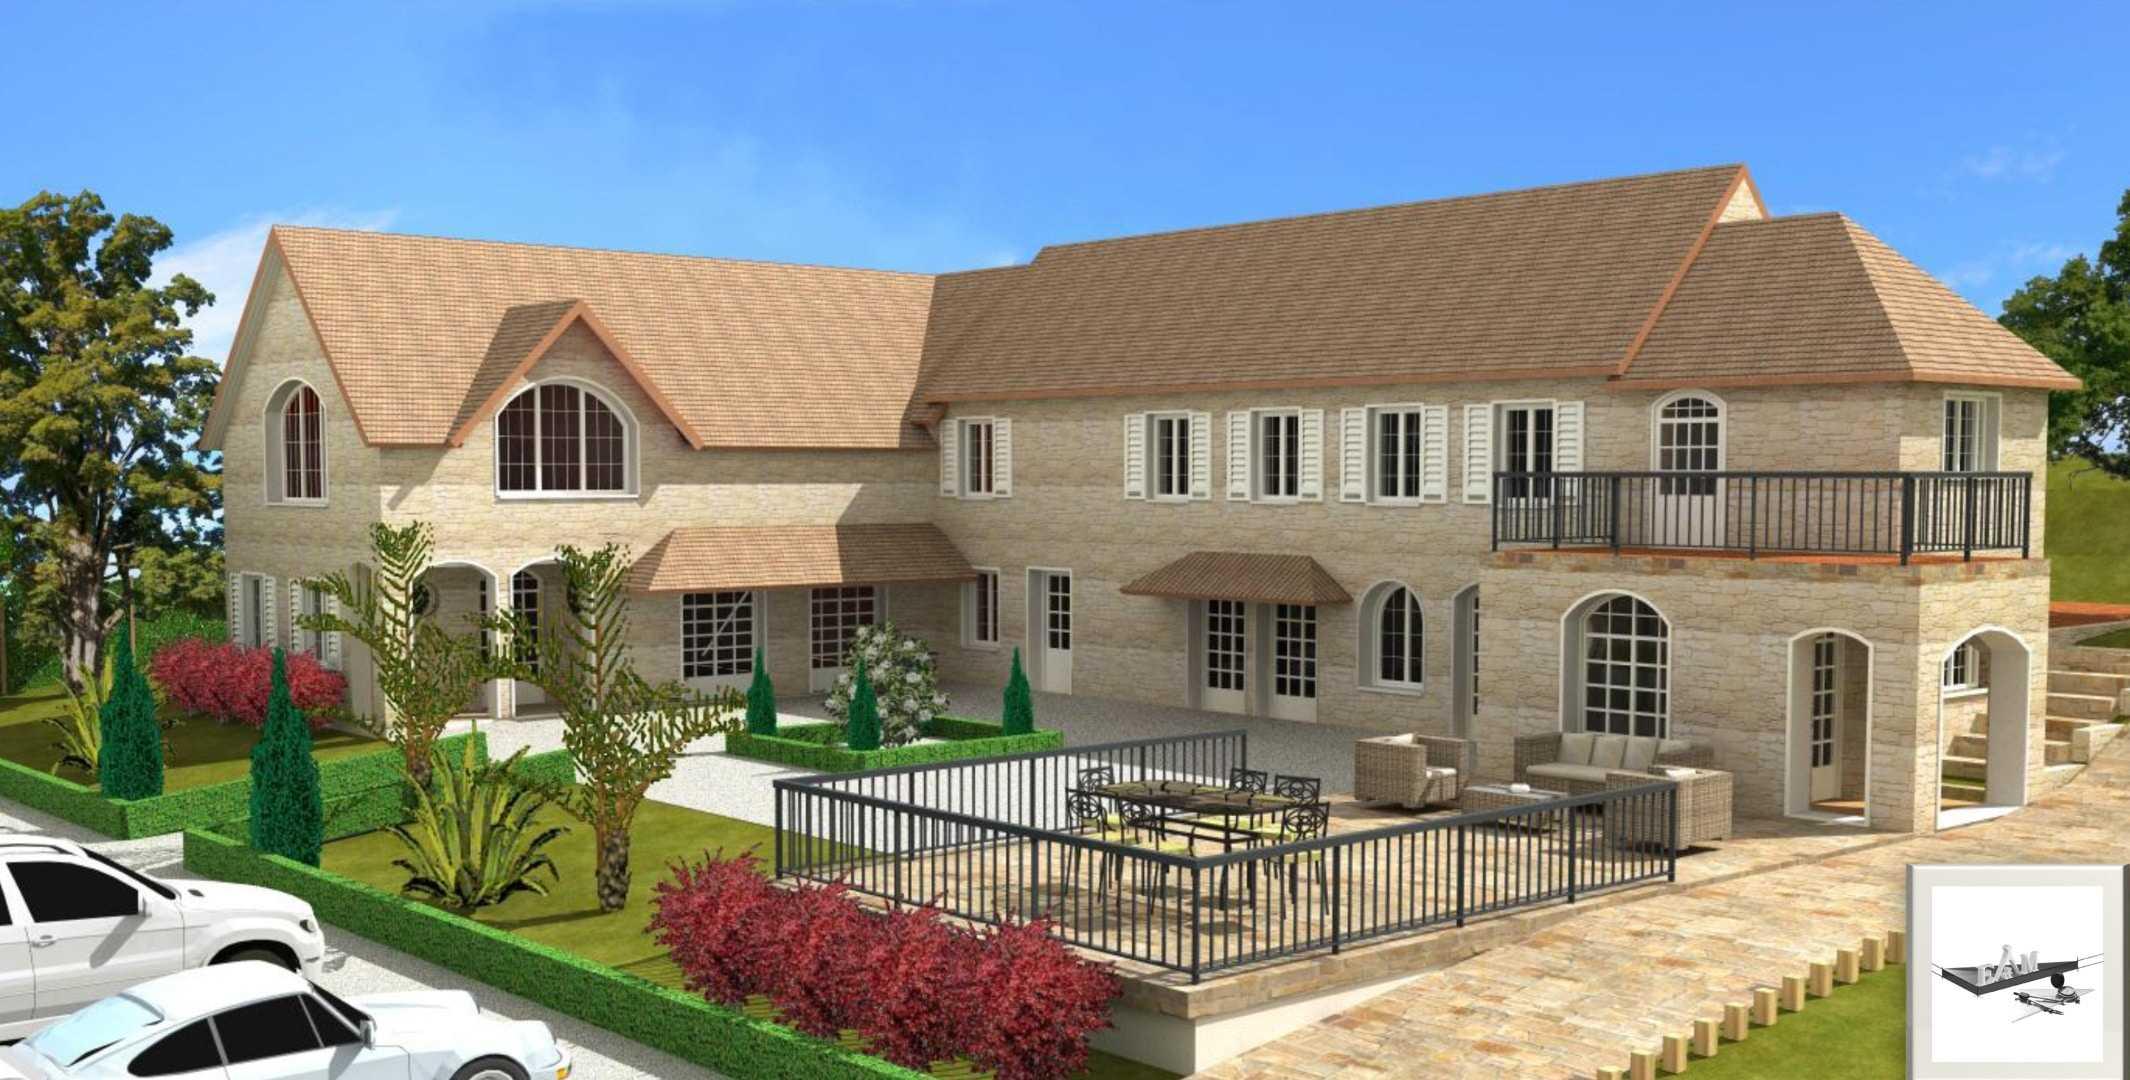 Transformation et agrandissement d'une demeure normande de standing